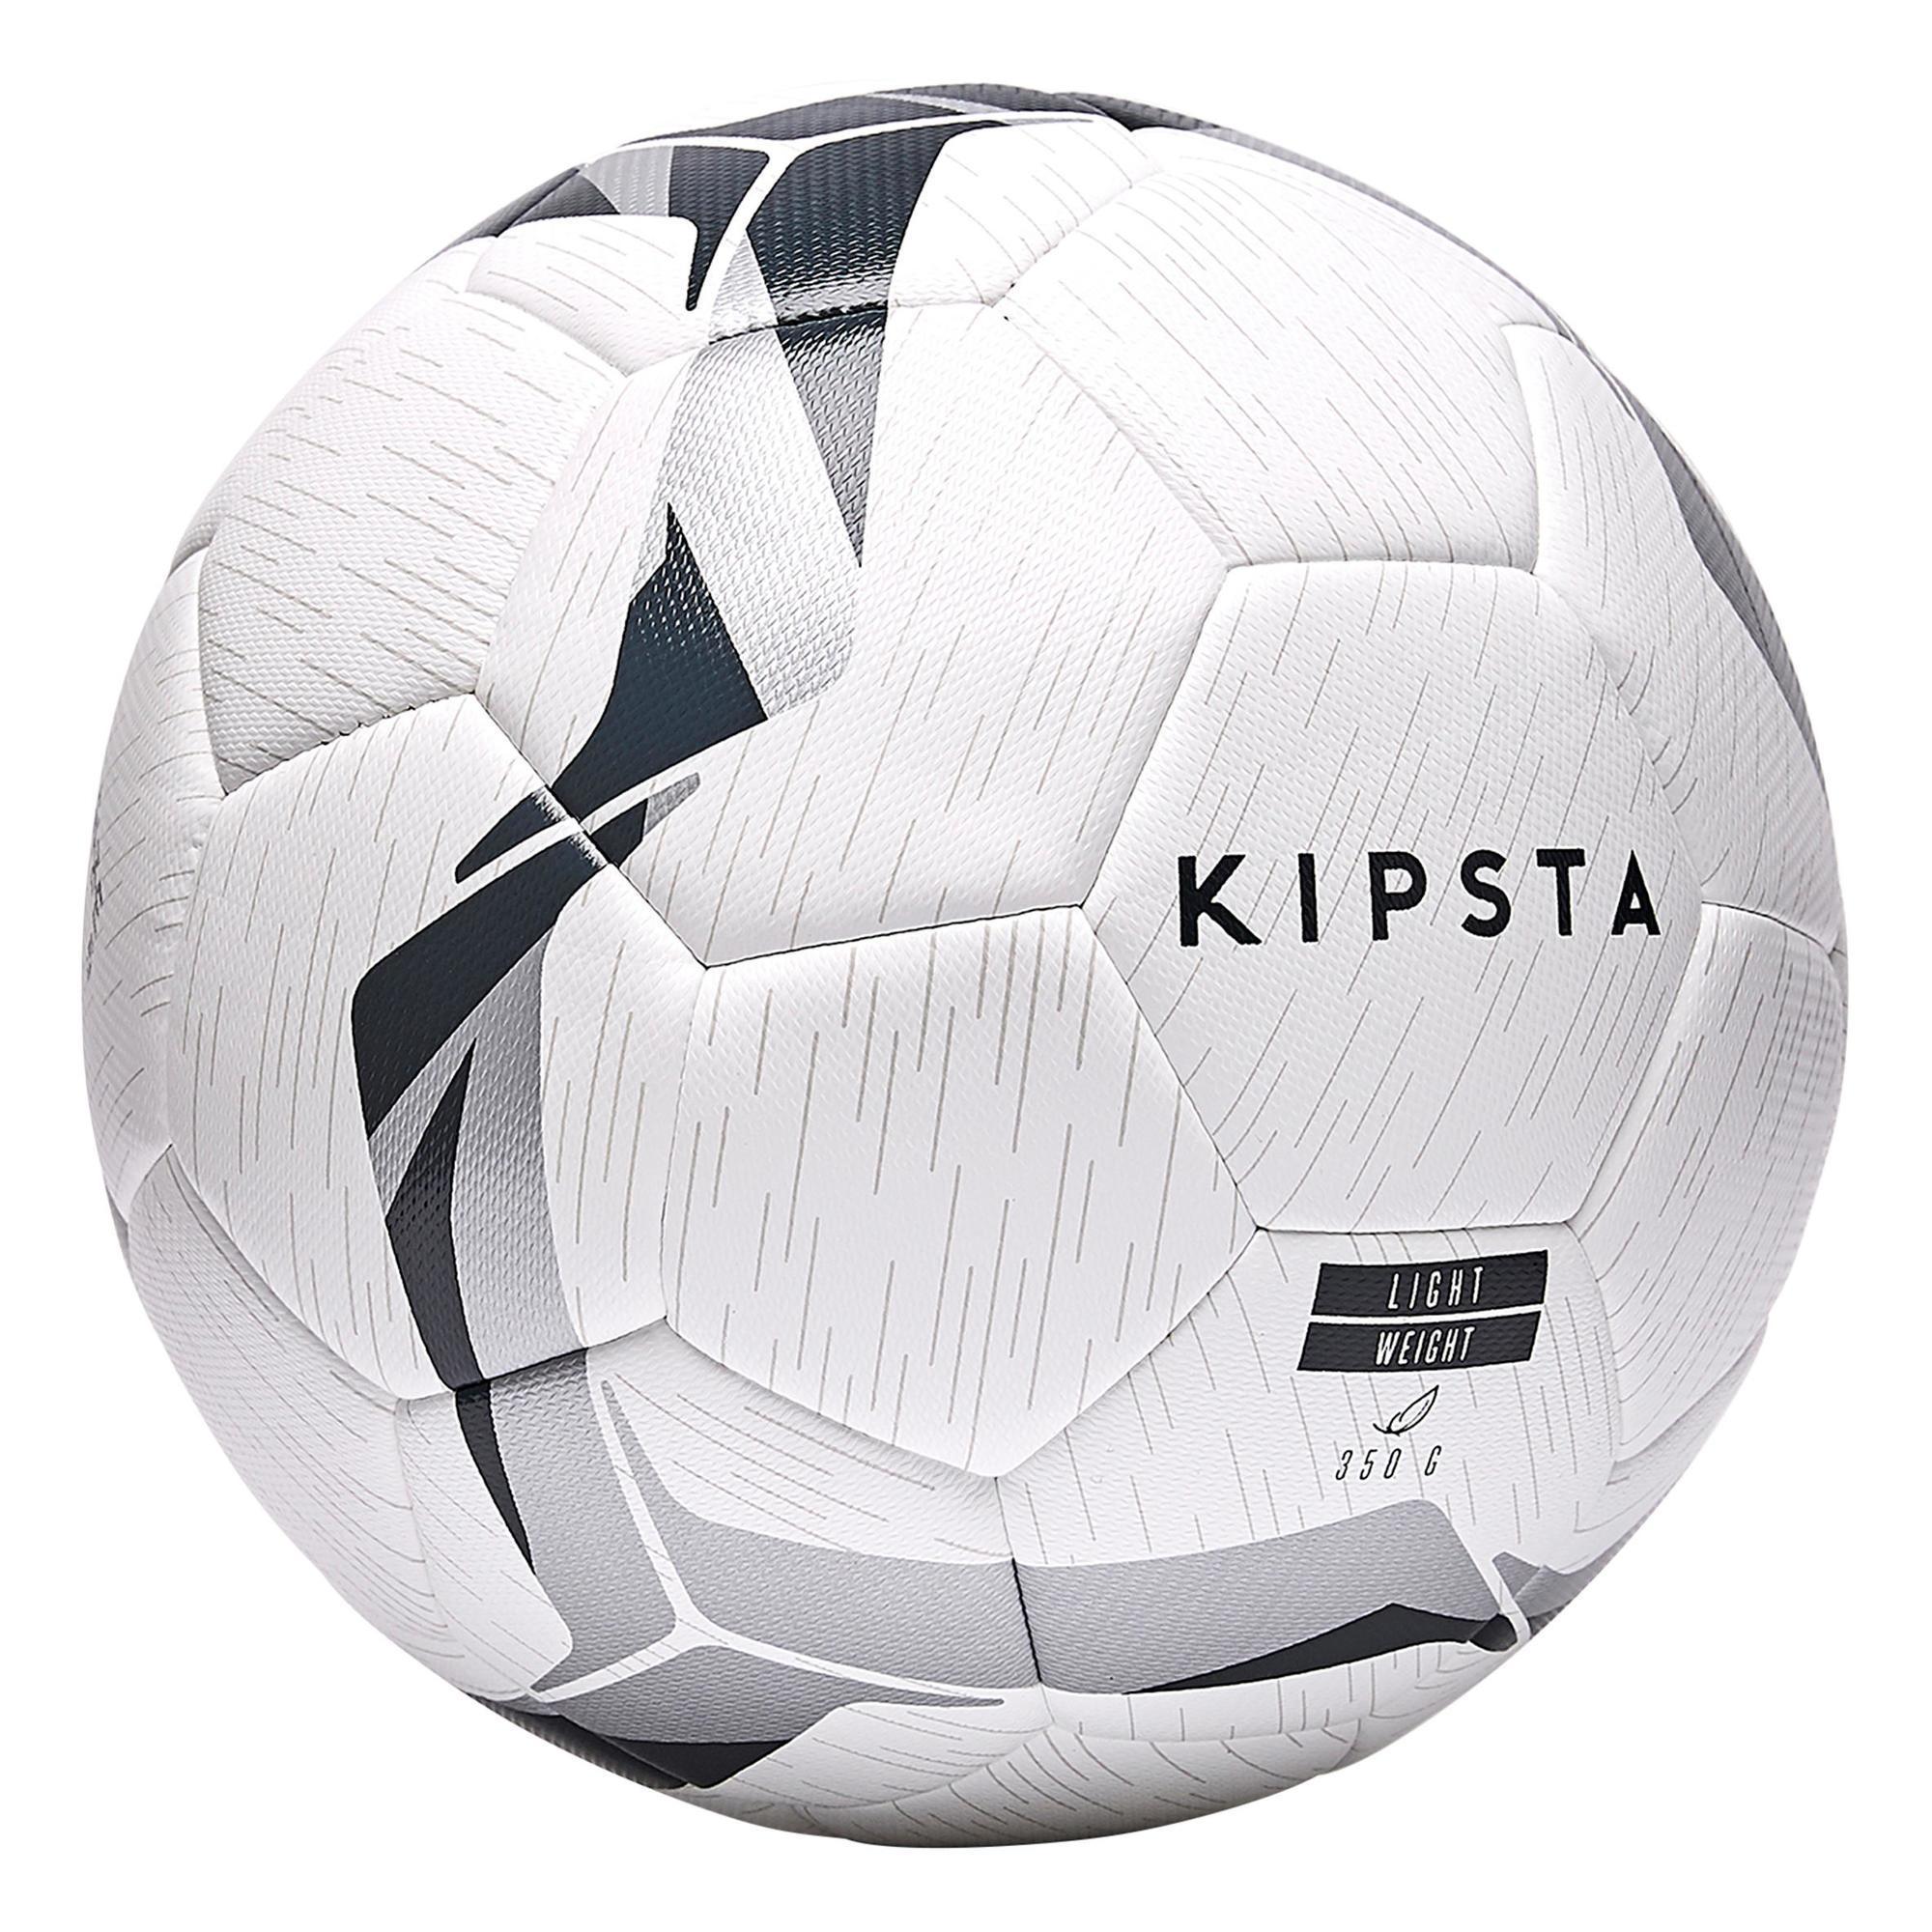 Kipsta Voetbal F100 Hybride light maat 5